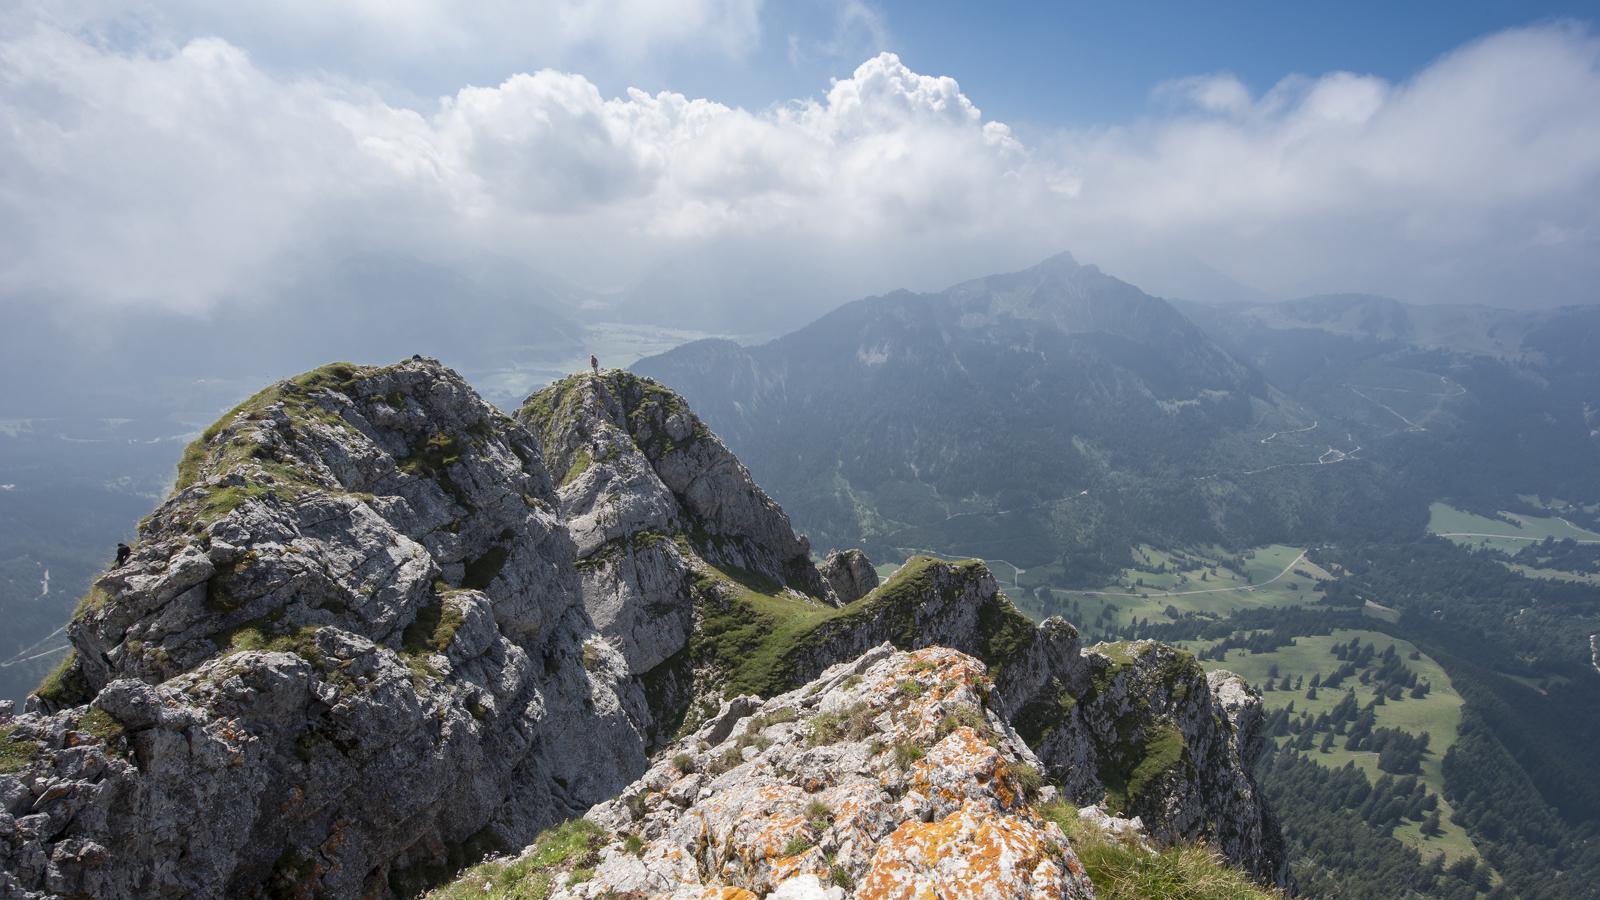 Gipfel des Aggensteins in Pfronten © Klaus-Peter Kappest, Germany